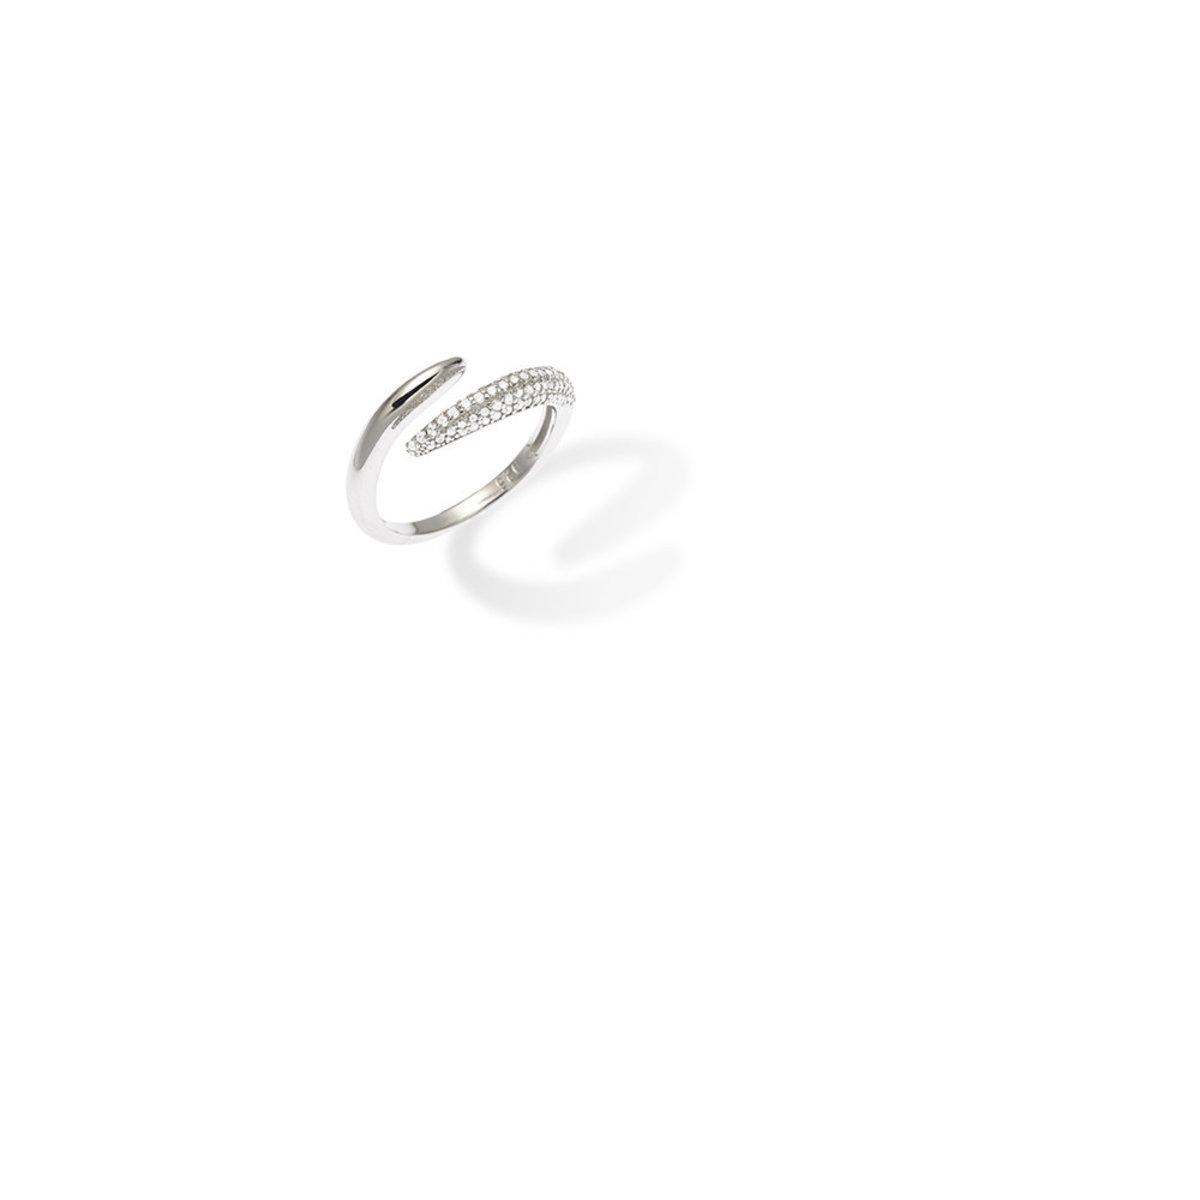 Tresor: 925 silver, CZ stone ring